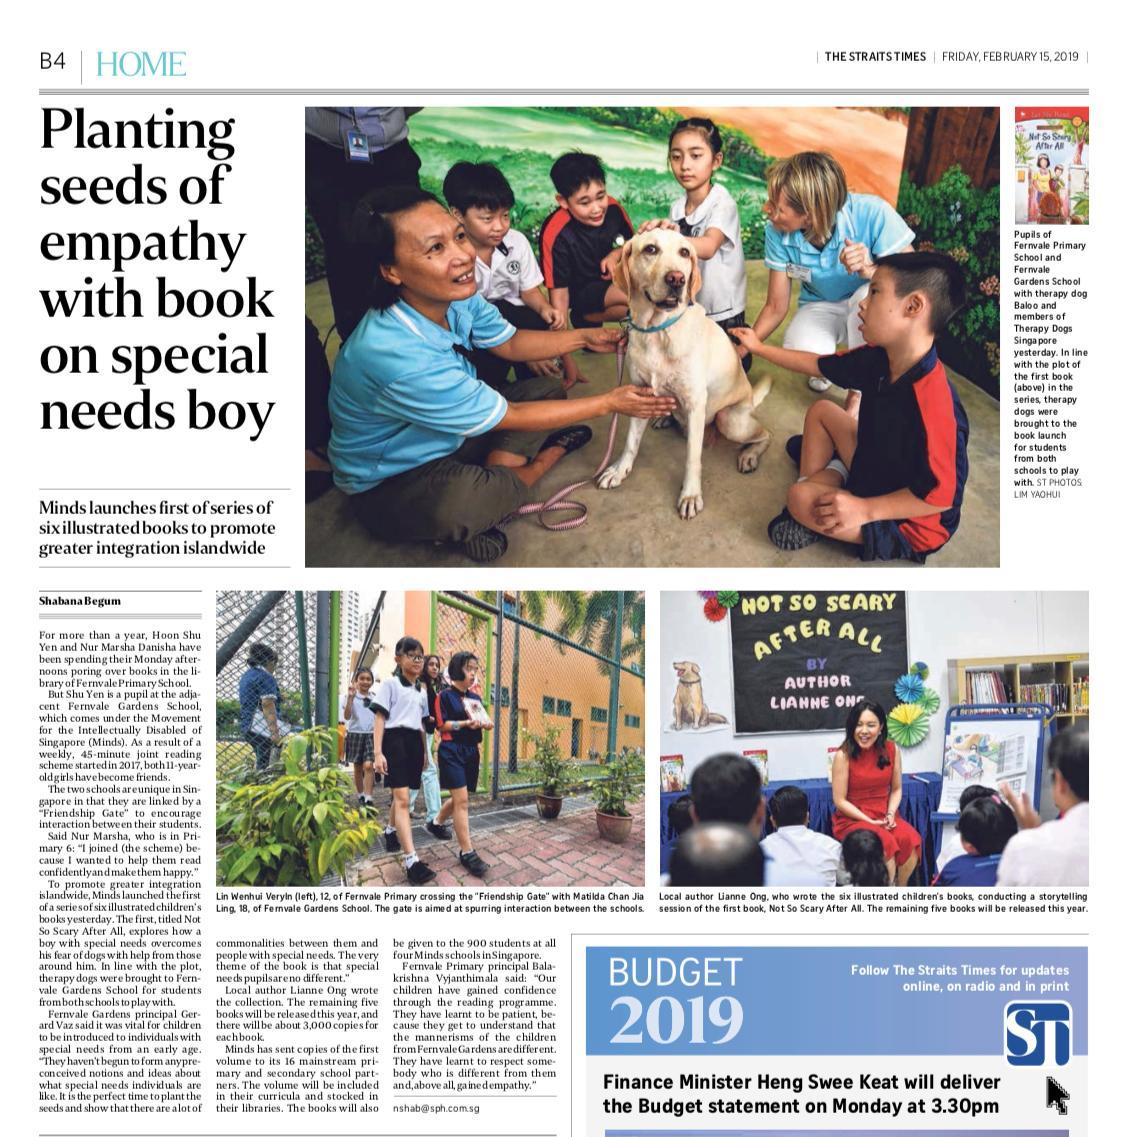 The Straits Times 15 February 2019